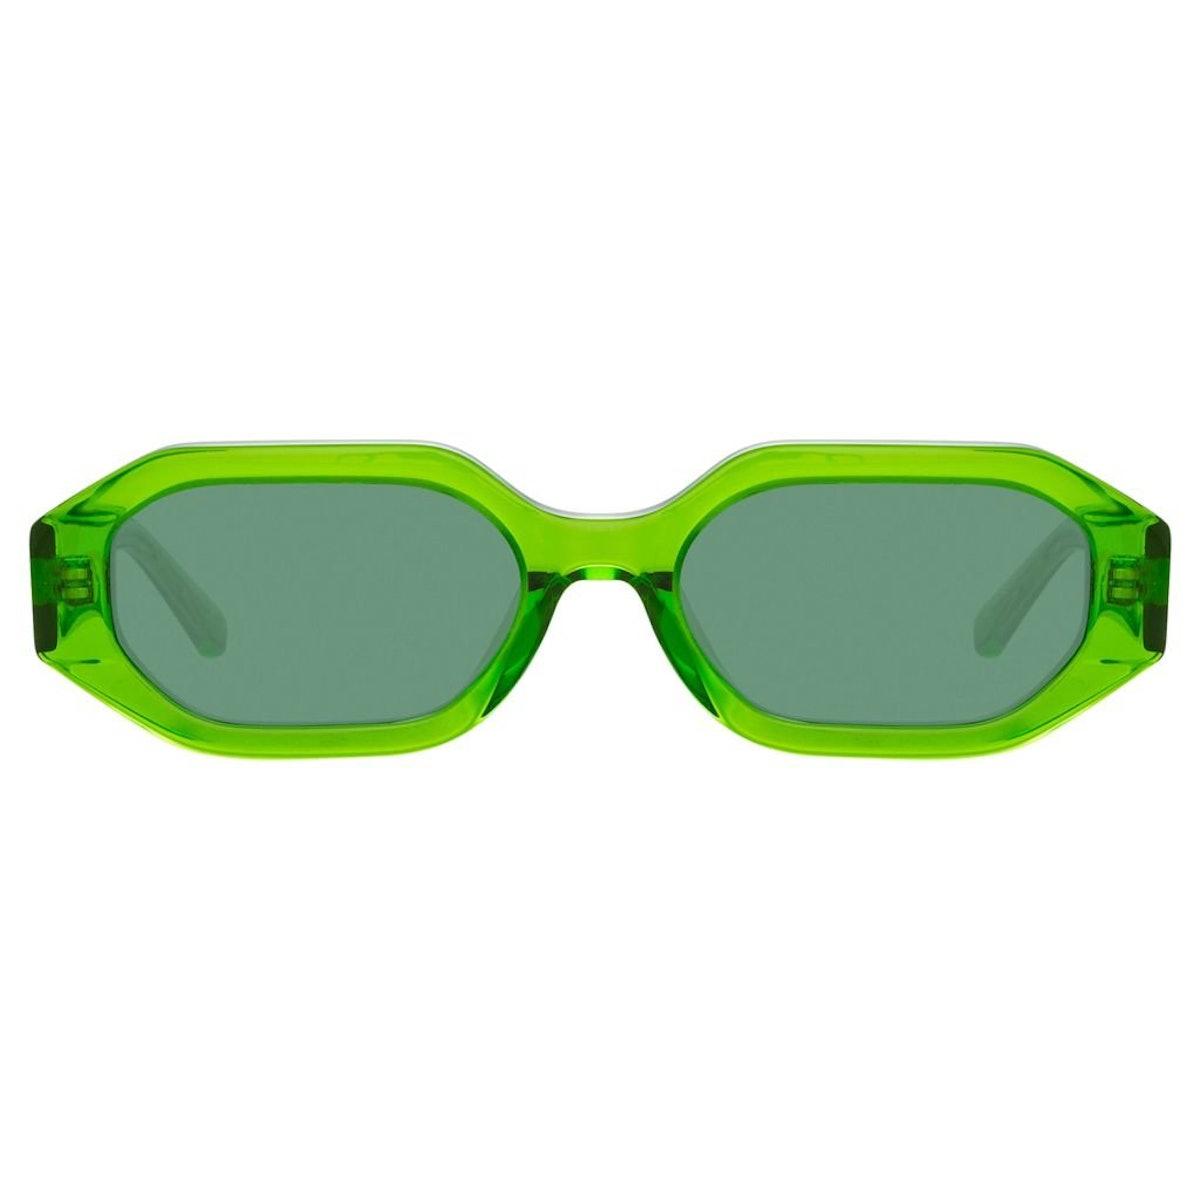 The Attico Irene Angular Sunglasses in Green: additional image